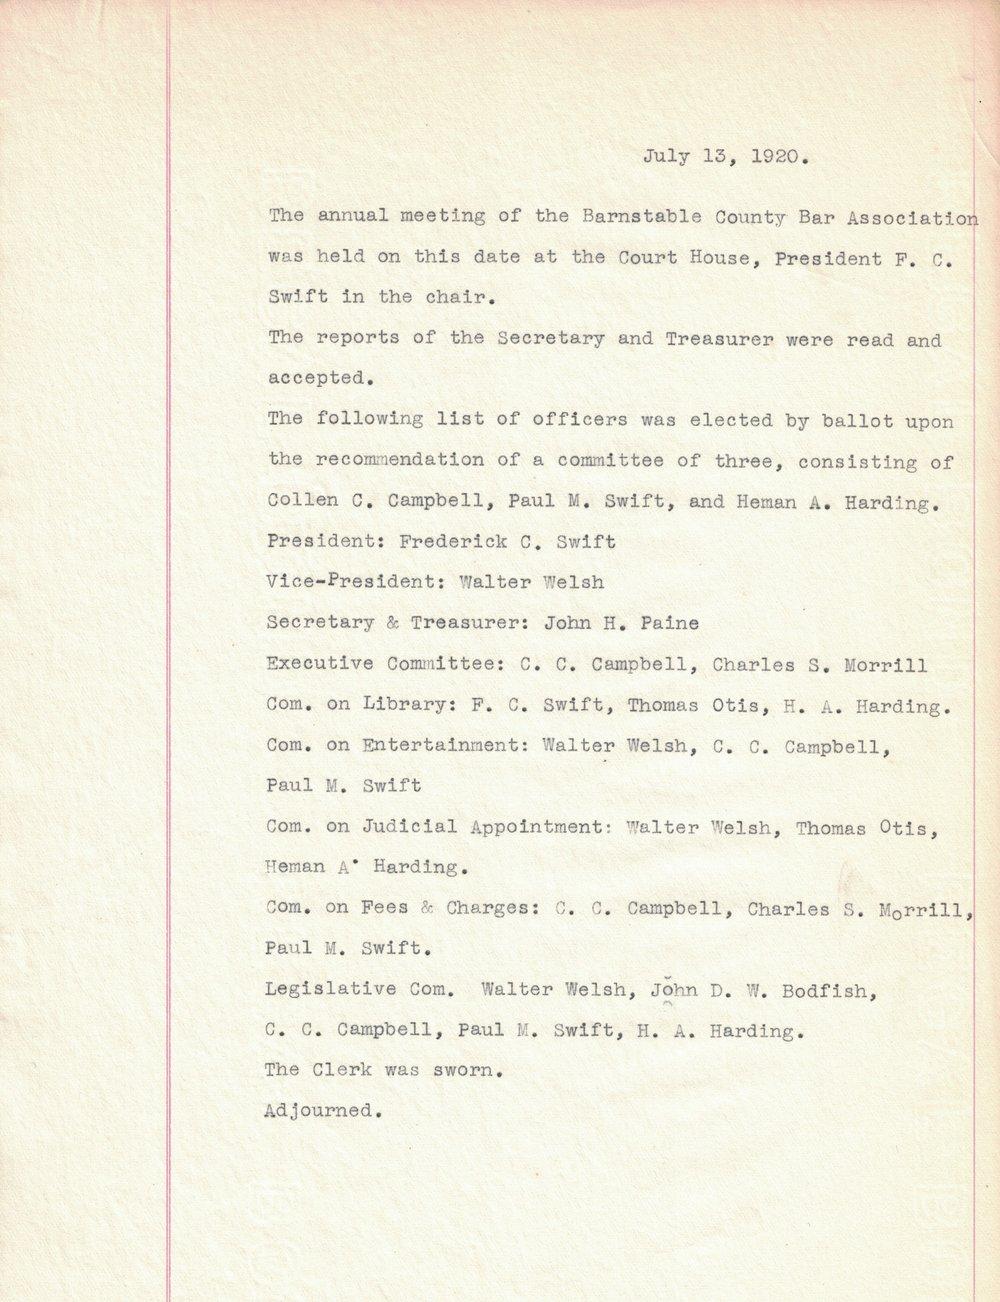 1920 Minutes